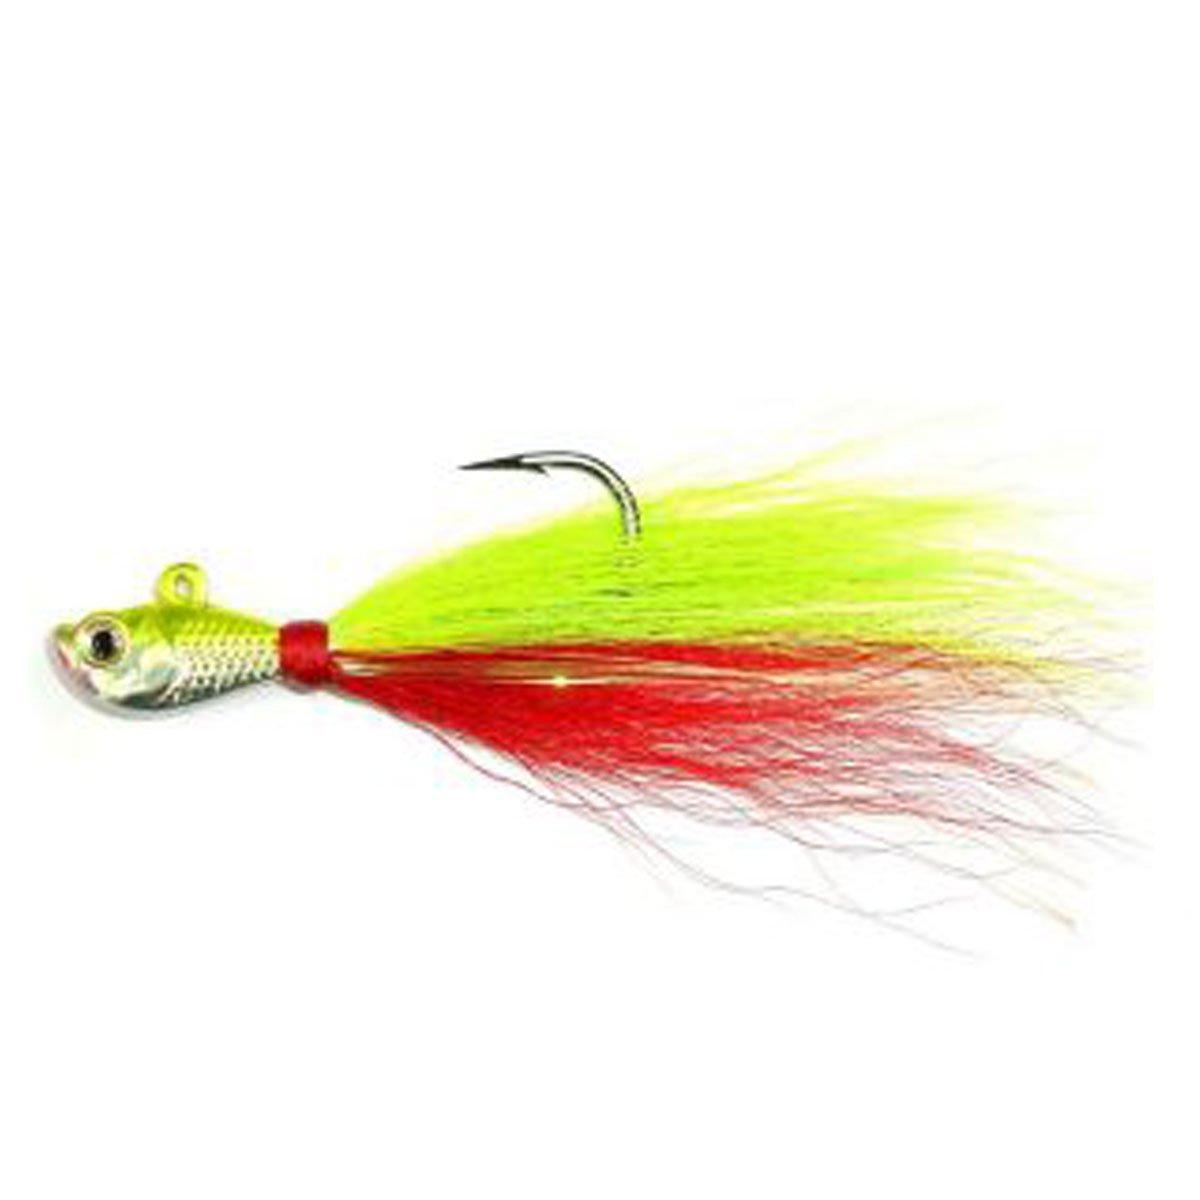 cee1482f8 pesca+varas+de+pesca+carretilha+vara+pro+fishing+6+14+lbs+561+bc+1+ ...